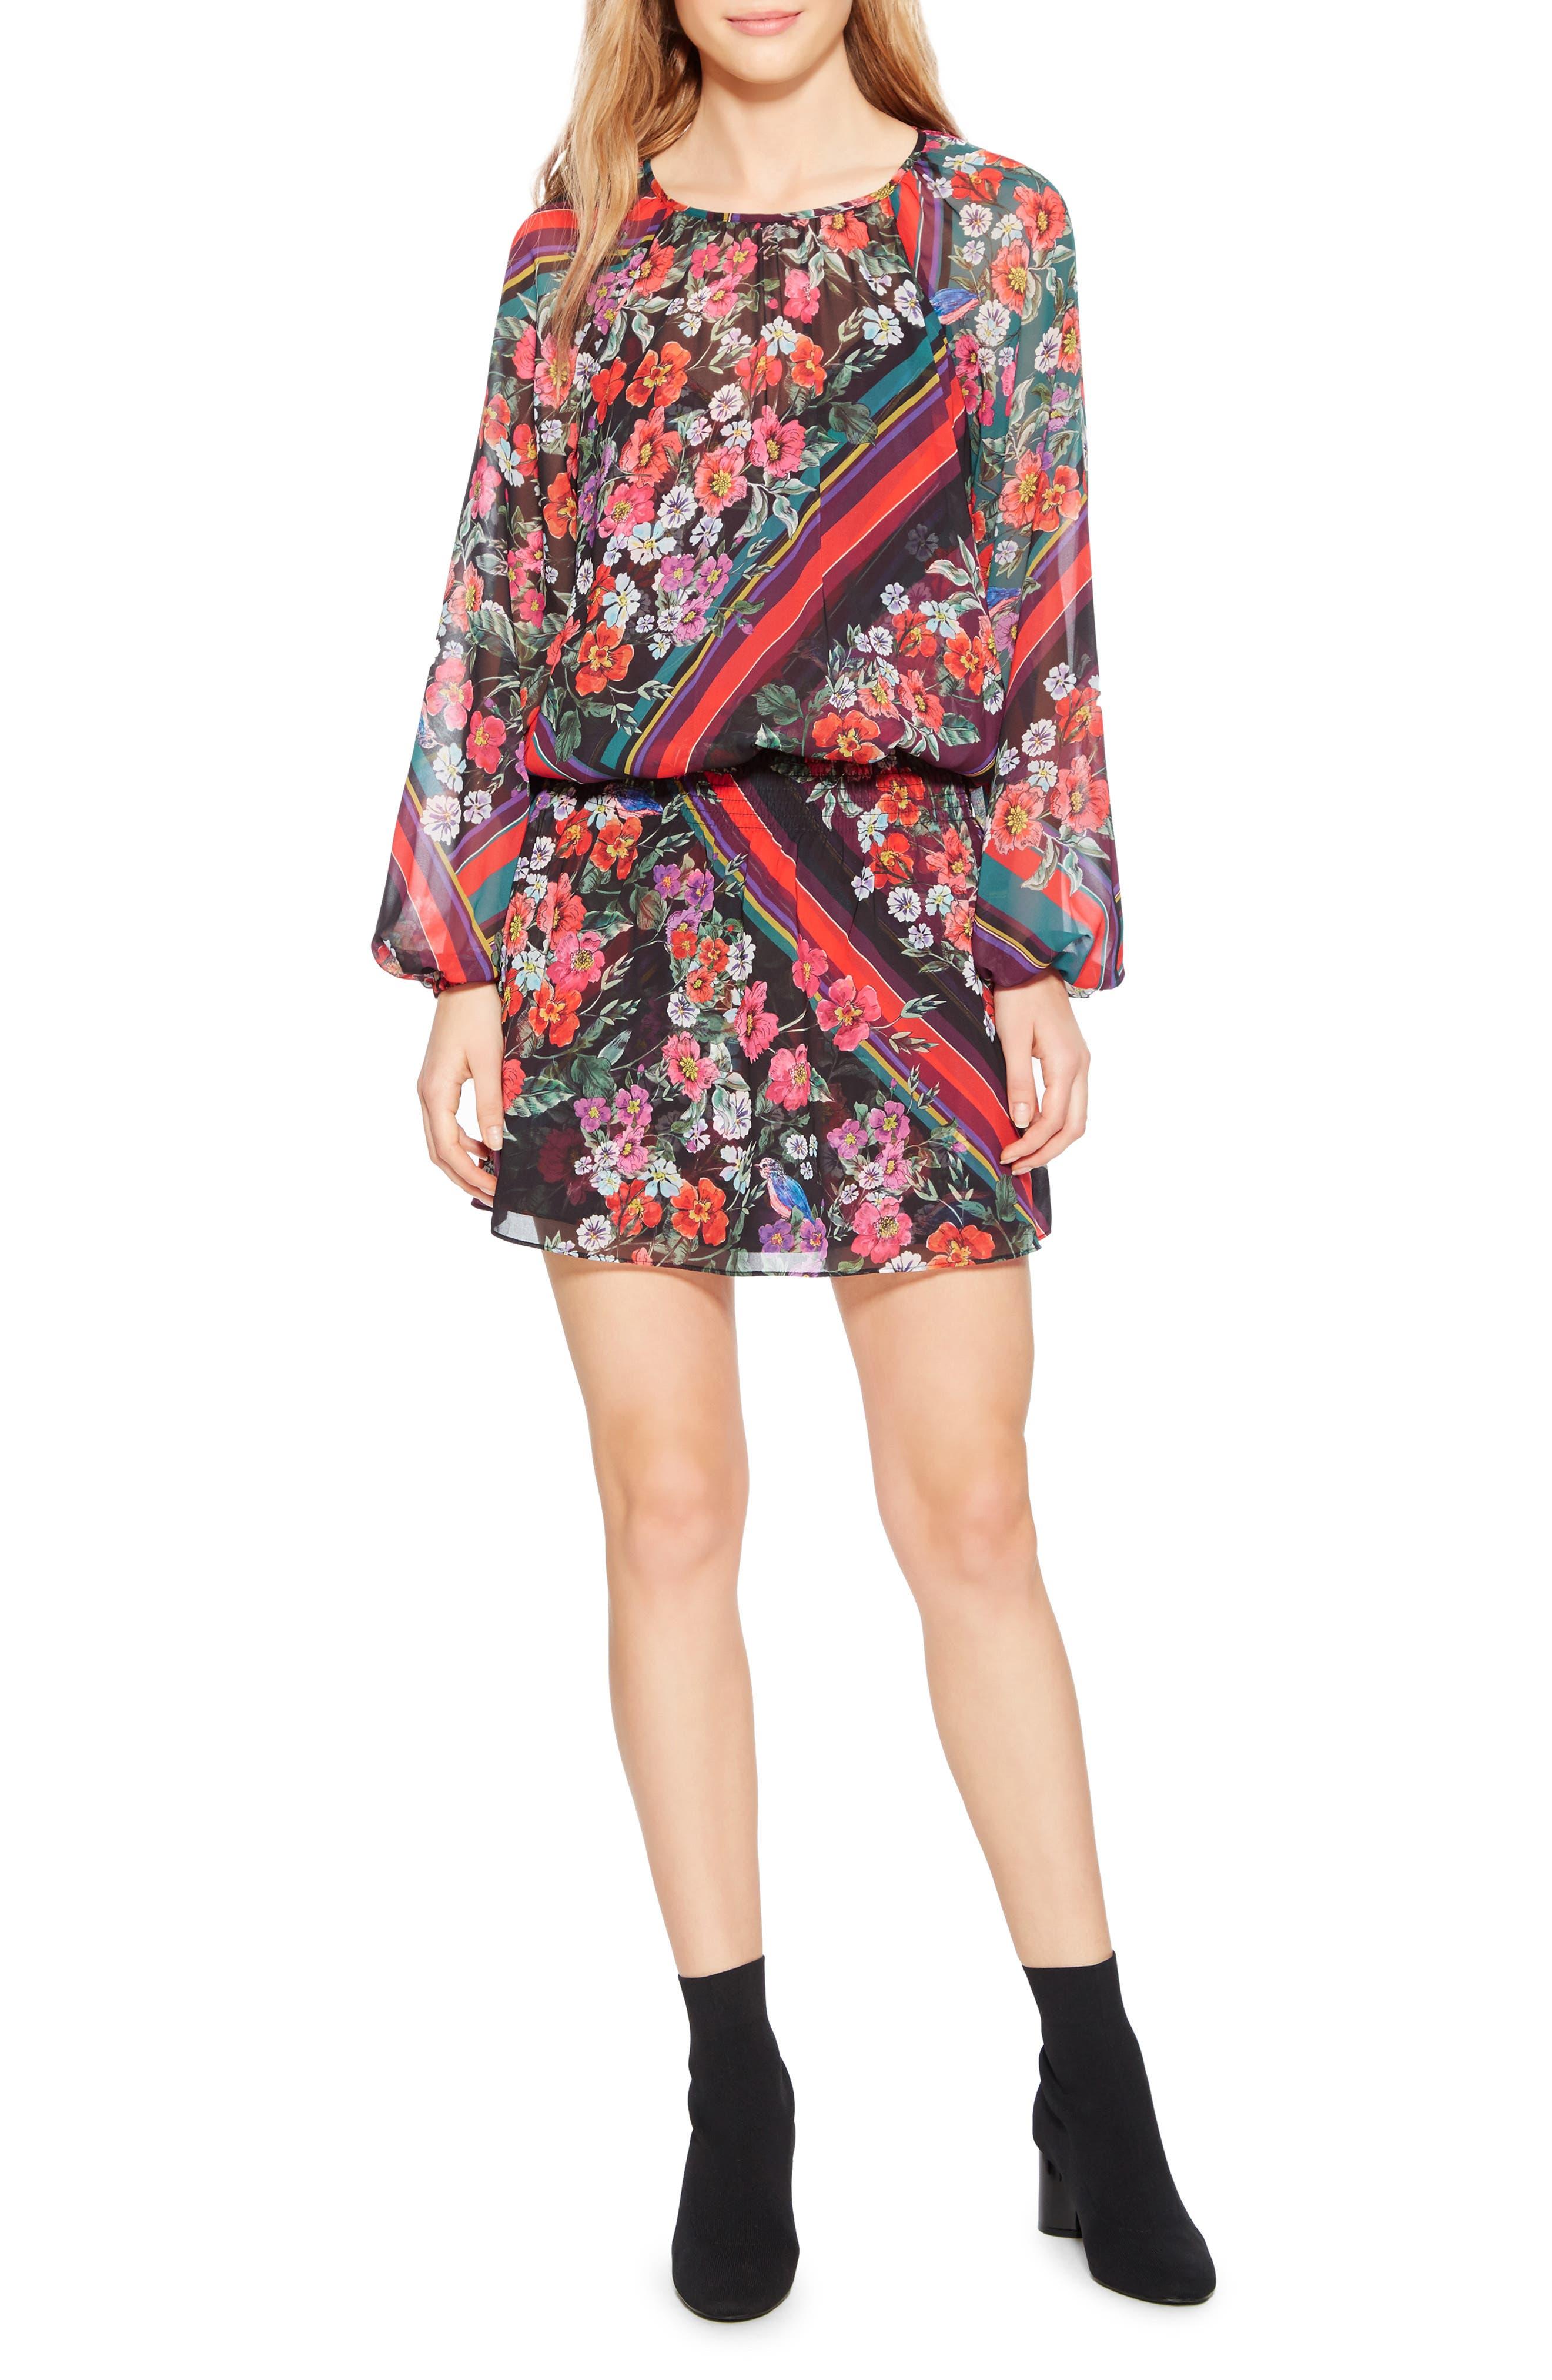 PARKER Christina Floral-Print Blouson Long-Sleeve Dress in Madison Stripe